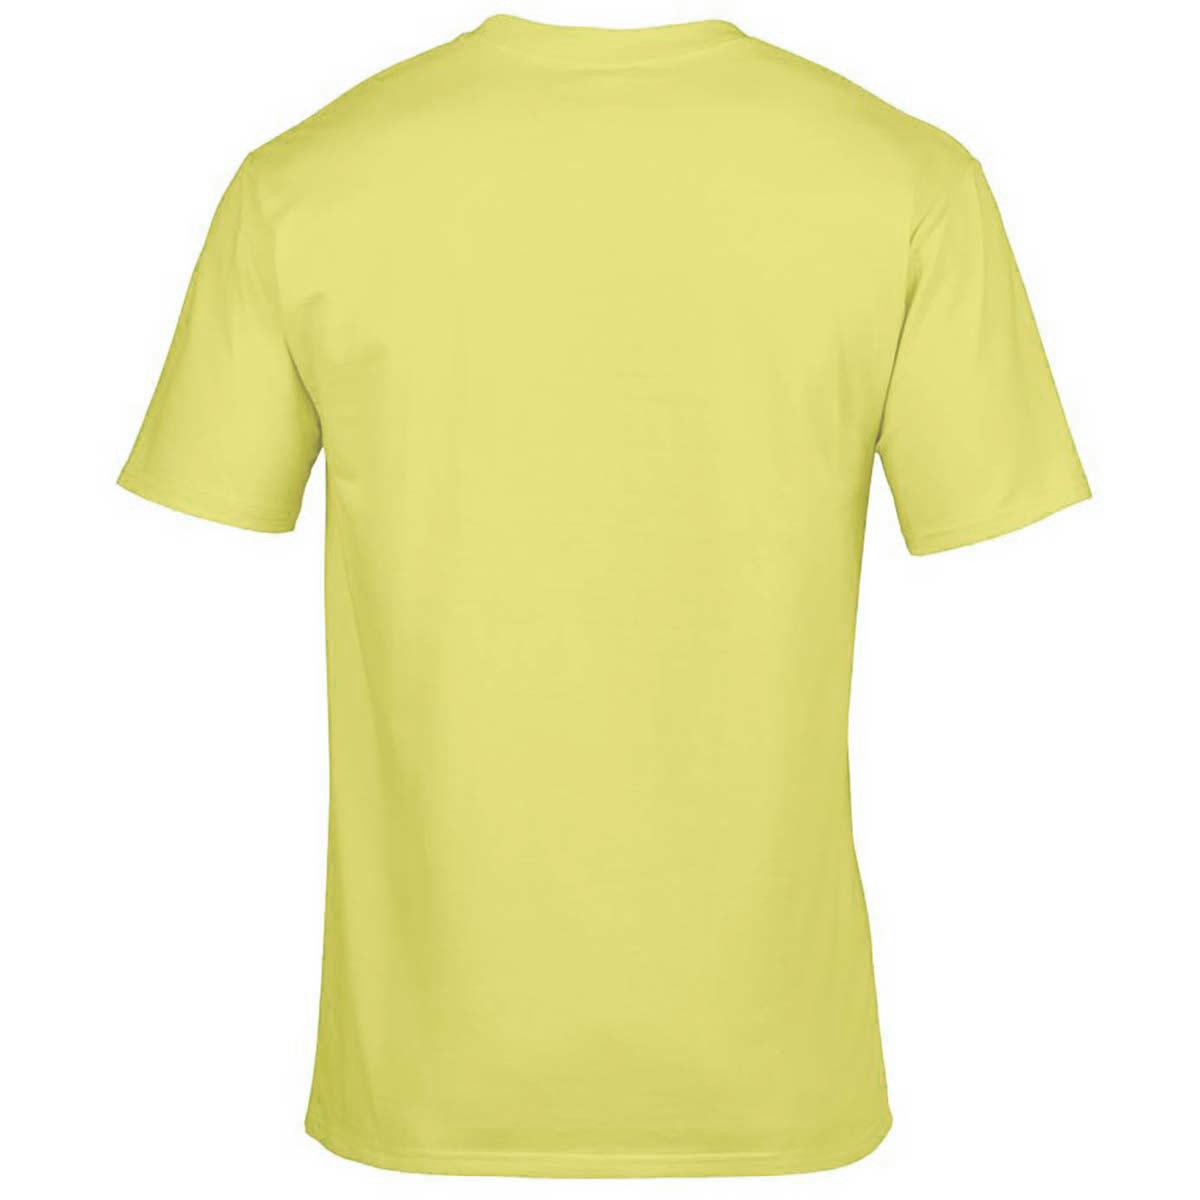 05_gd008_jaune_clair--0-0--c4aa1899-2626-4b90-9fb0-c3fd64e00c68